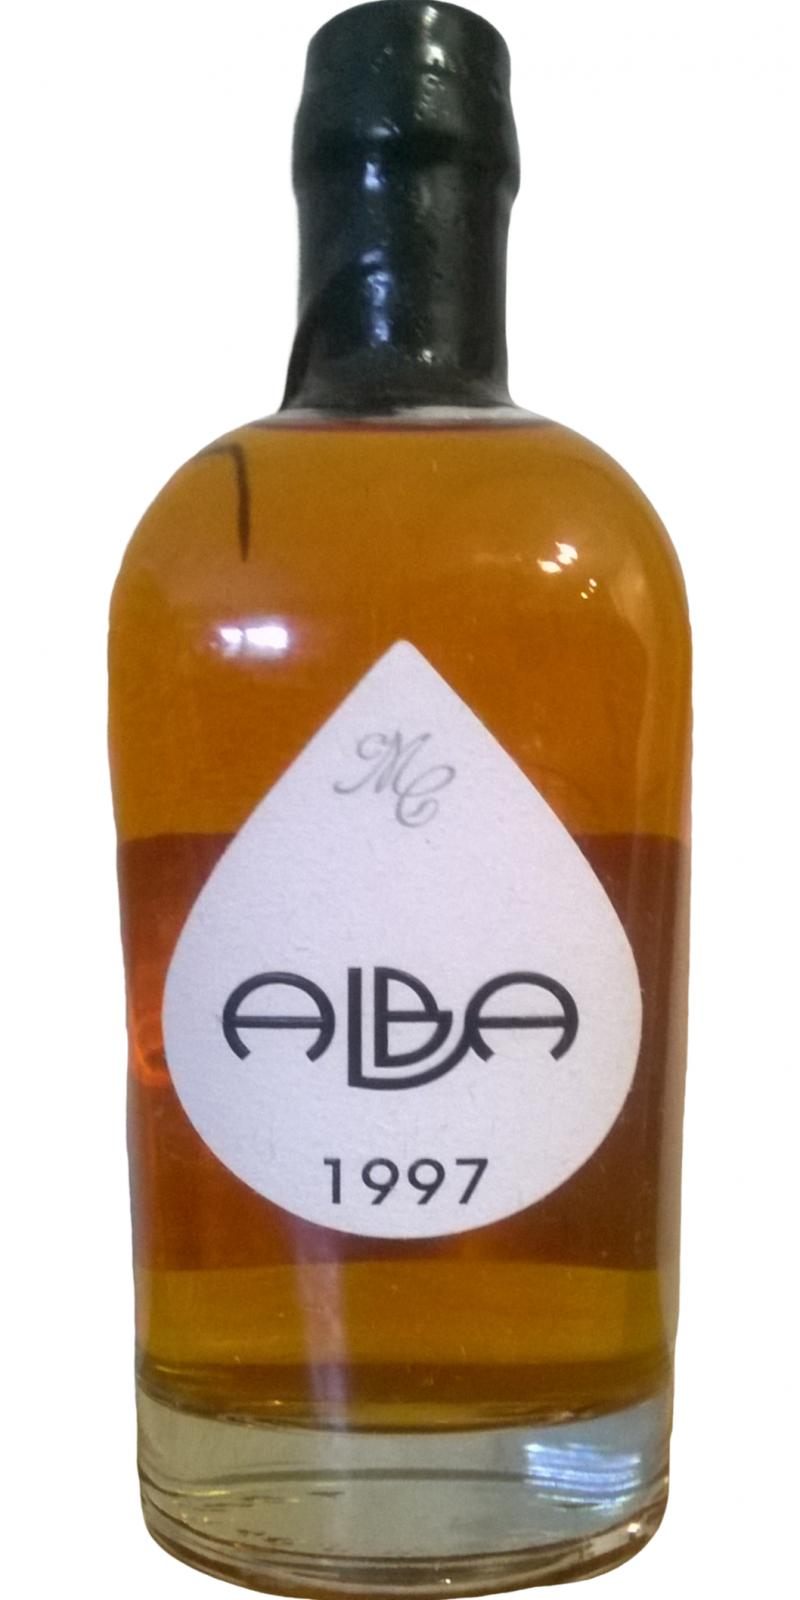 Alba 1997 MCo